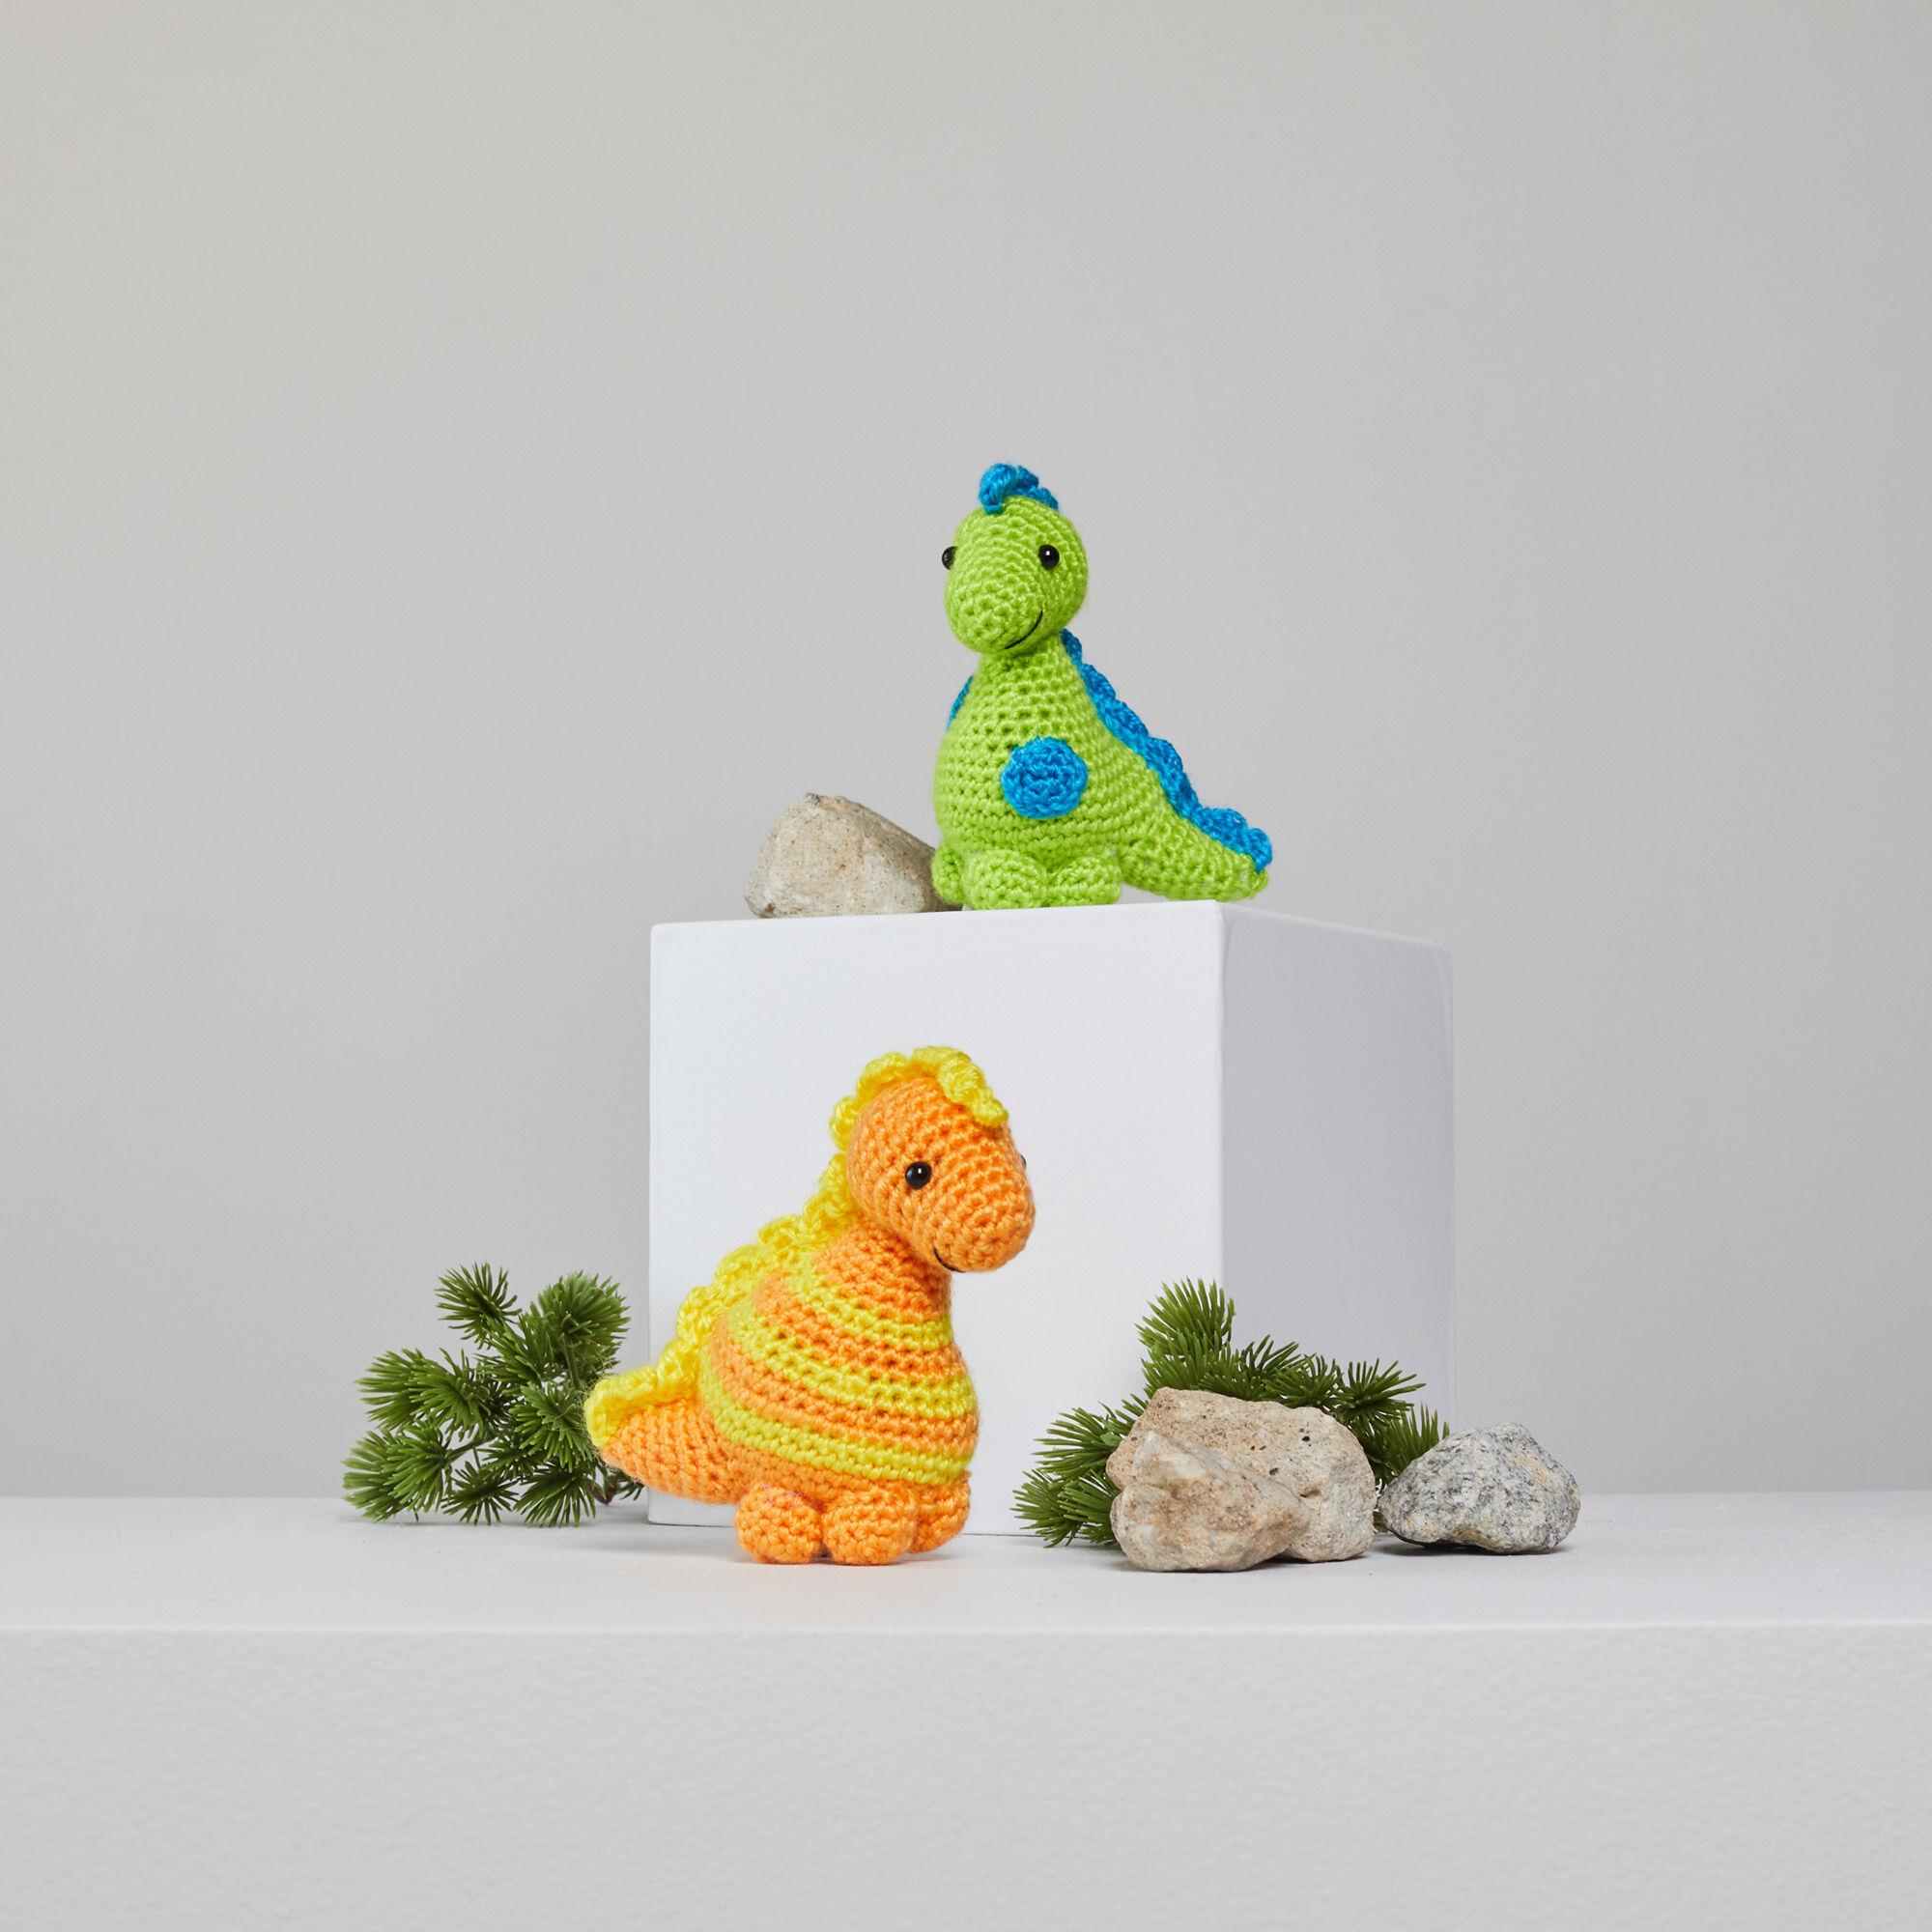 Triceratops Amigurumi Free Dinosaur Crochet Pattern ⋆ Crochet Kingdom | 2000x2000